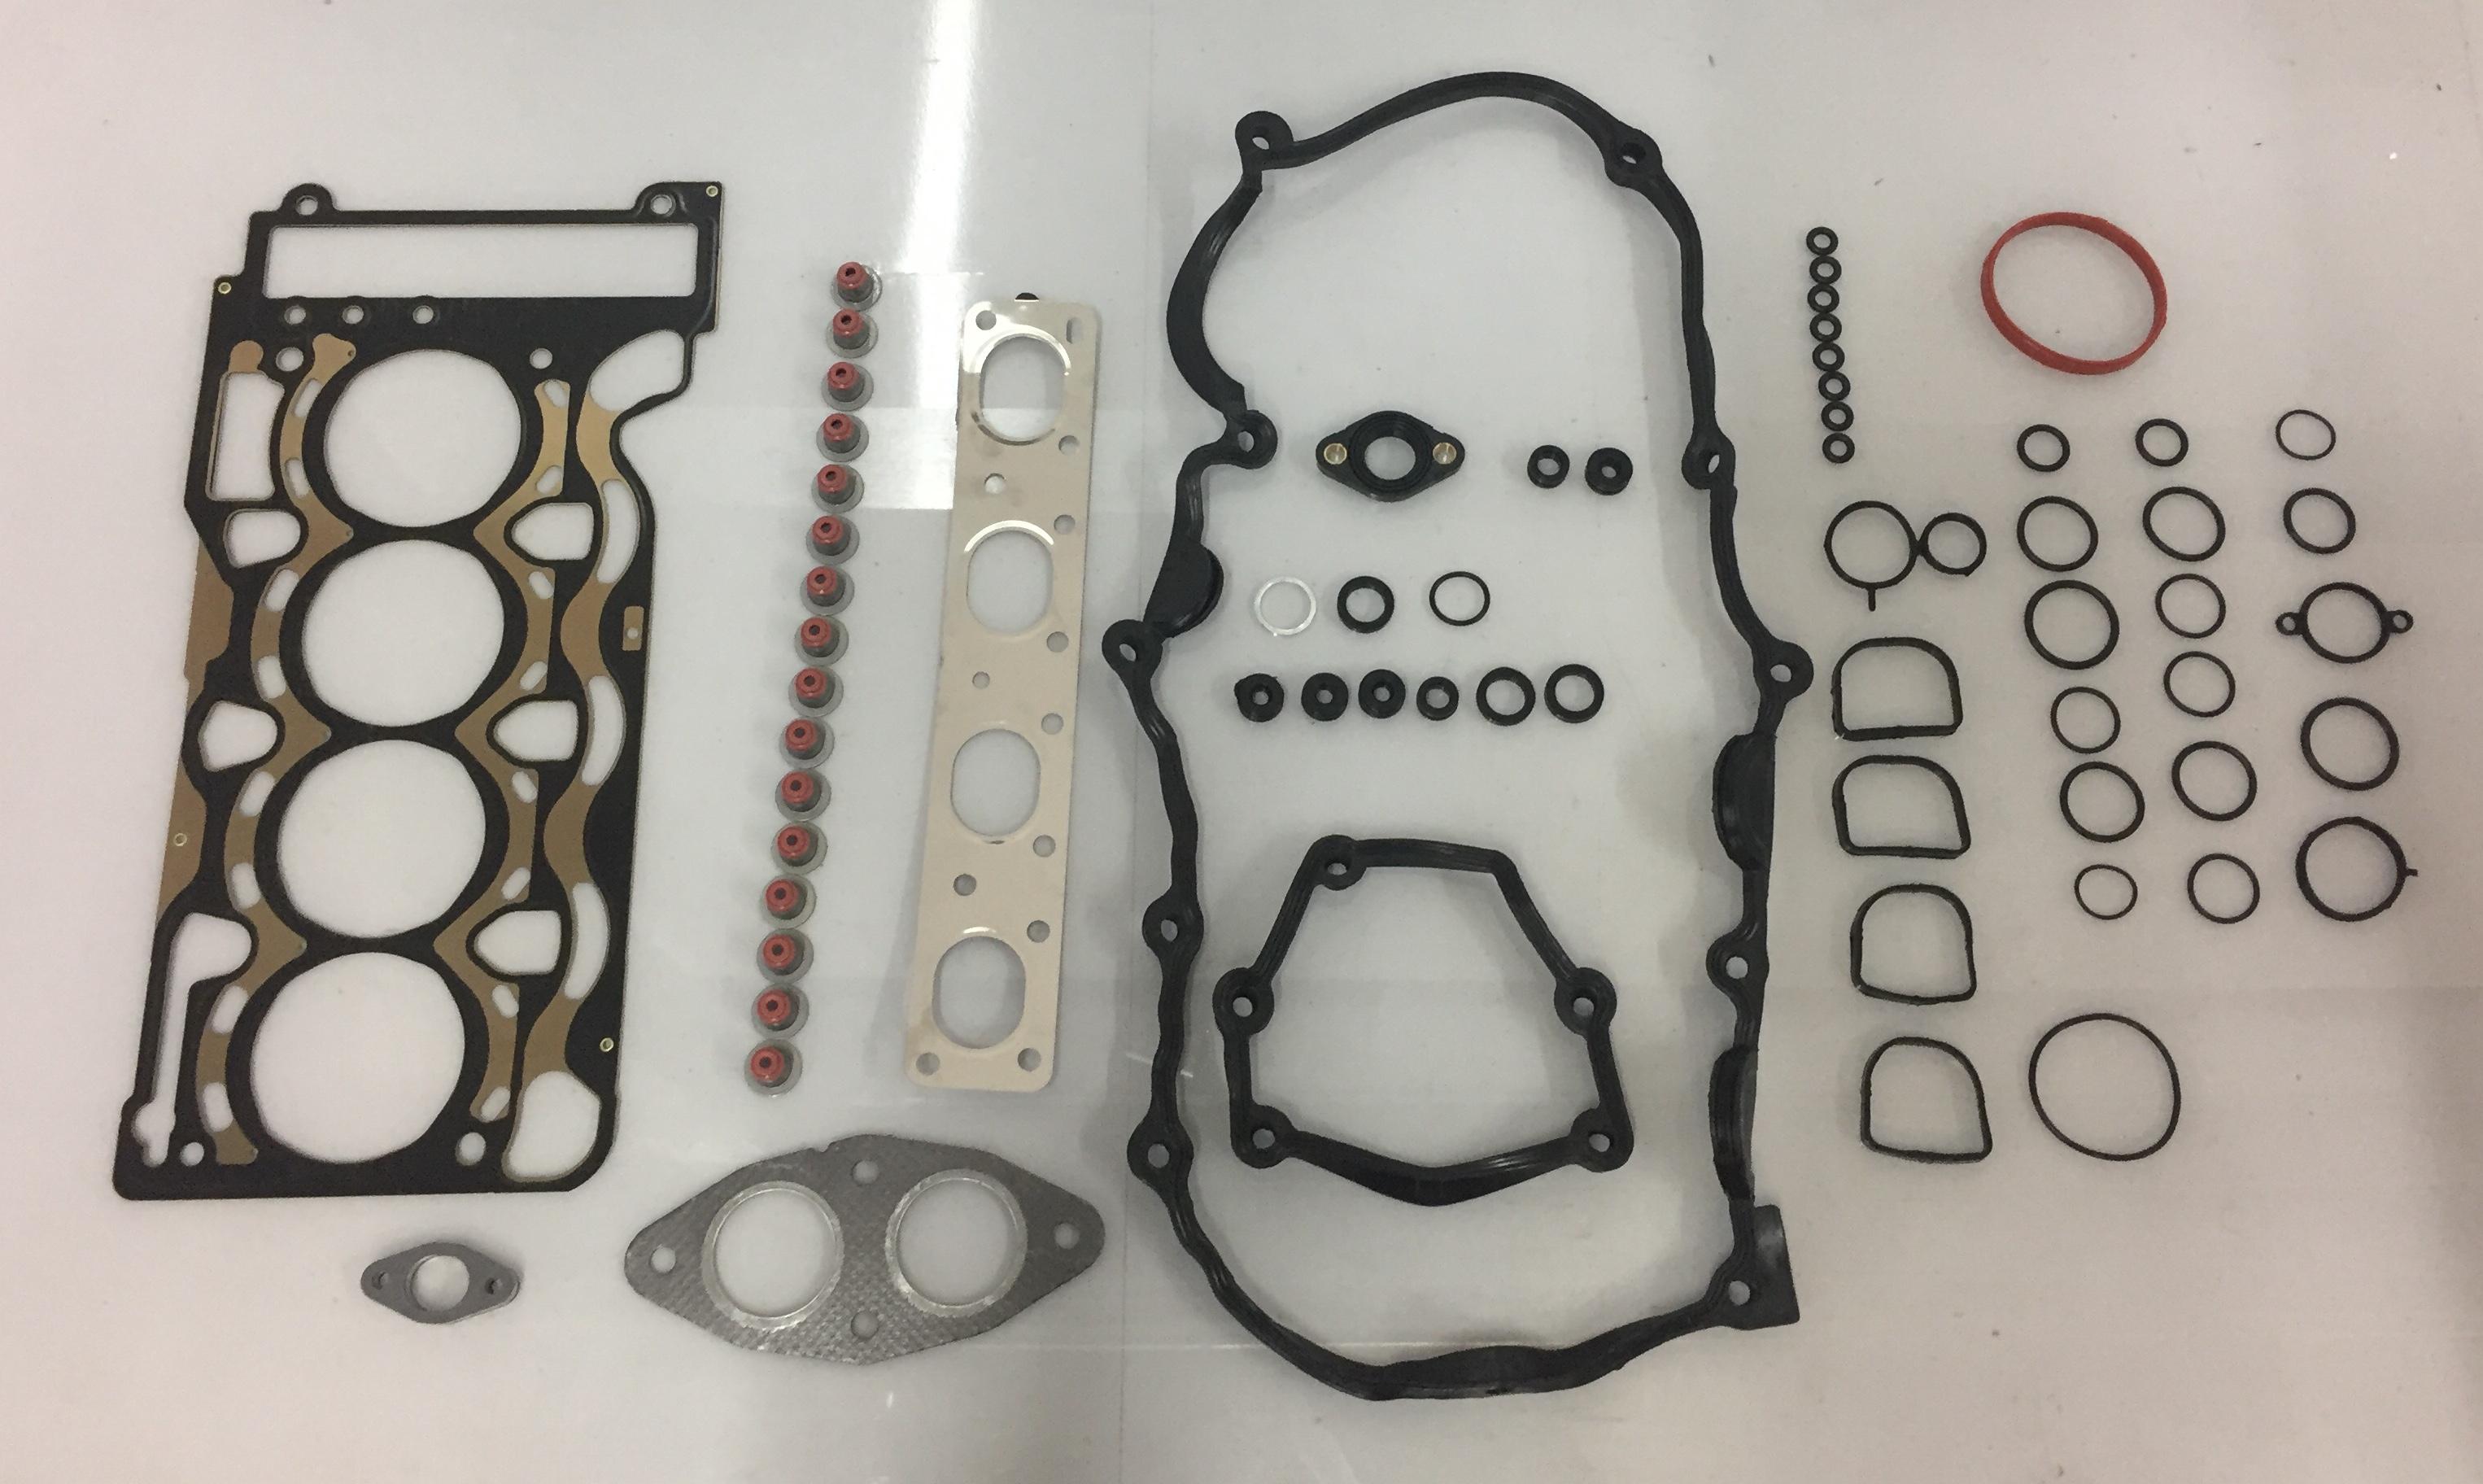 Zylinderkopfdichtung Zylinderkopfdichtsatz BMW 2,0 i N42 N42B20 NEU